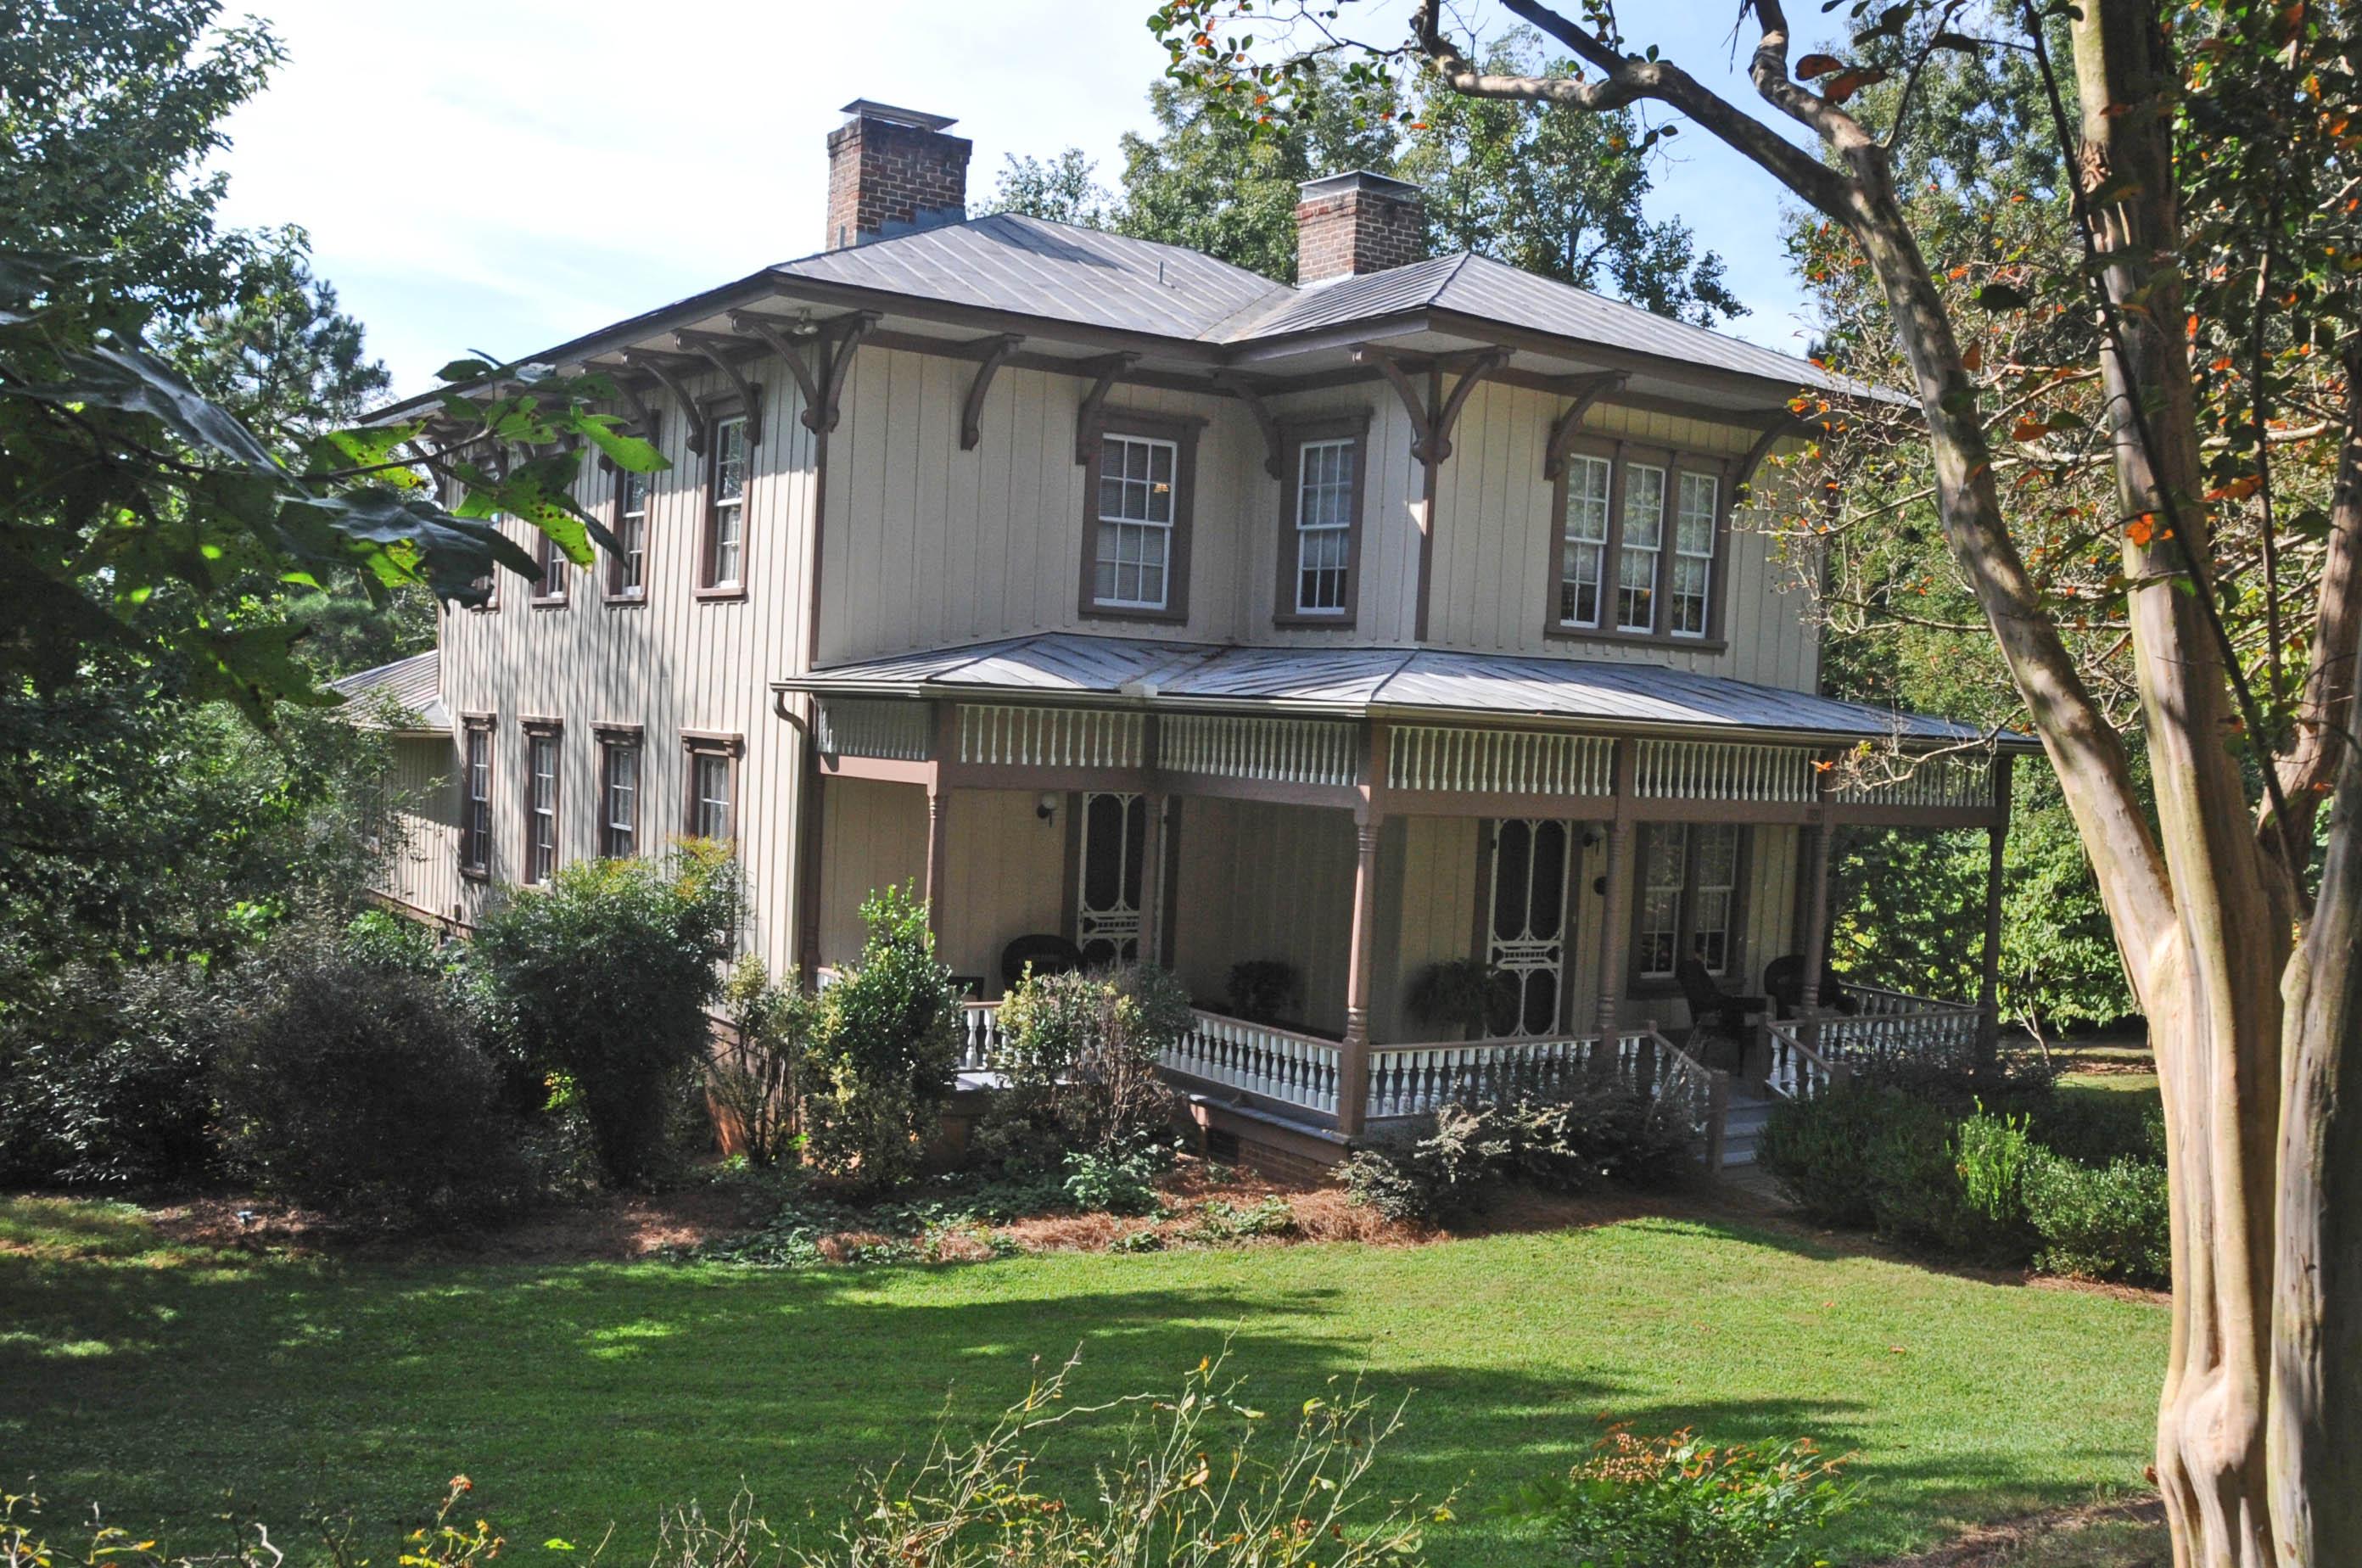 File:LENTZ HOTEL, MT. PLEASANT, CABARRUS COUNTY.jpg - Wikimediabalance of cabarrus county